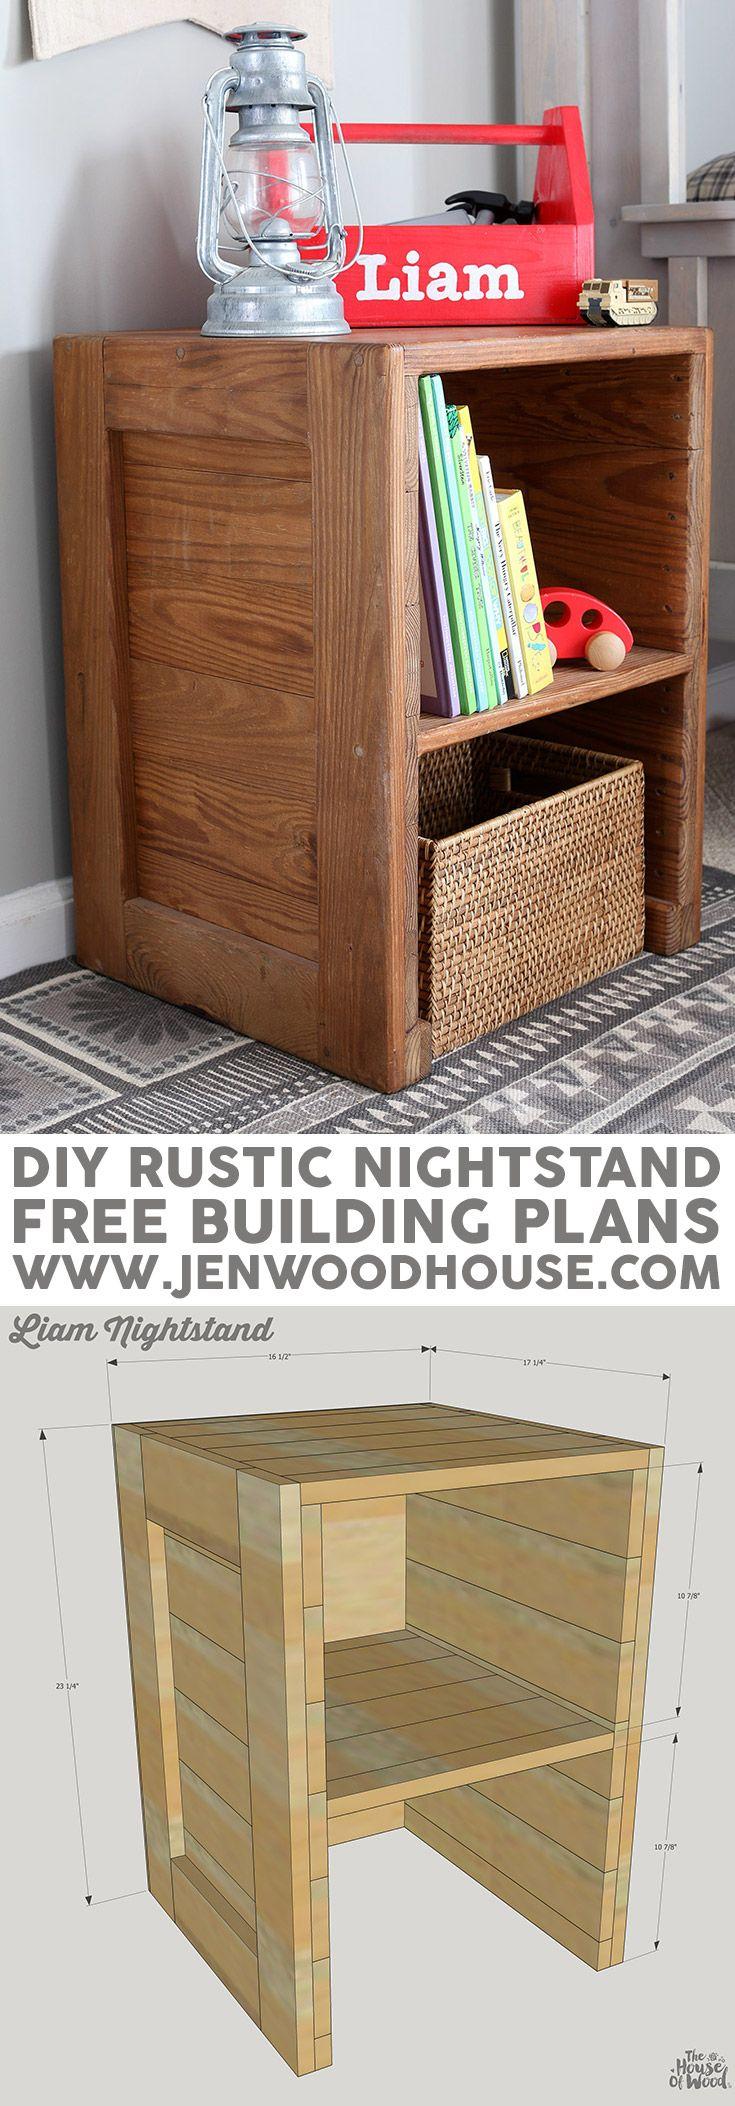 free plans: diy rustic nightstand | building plans, nightstands